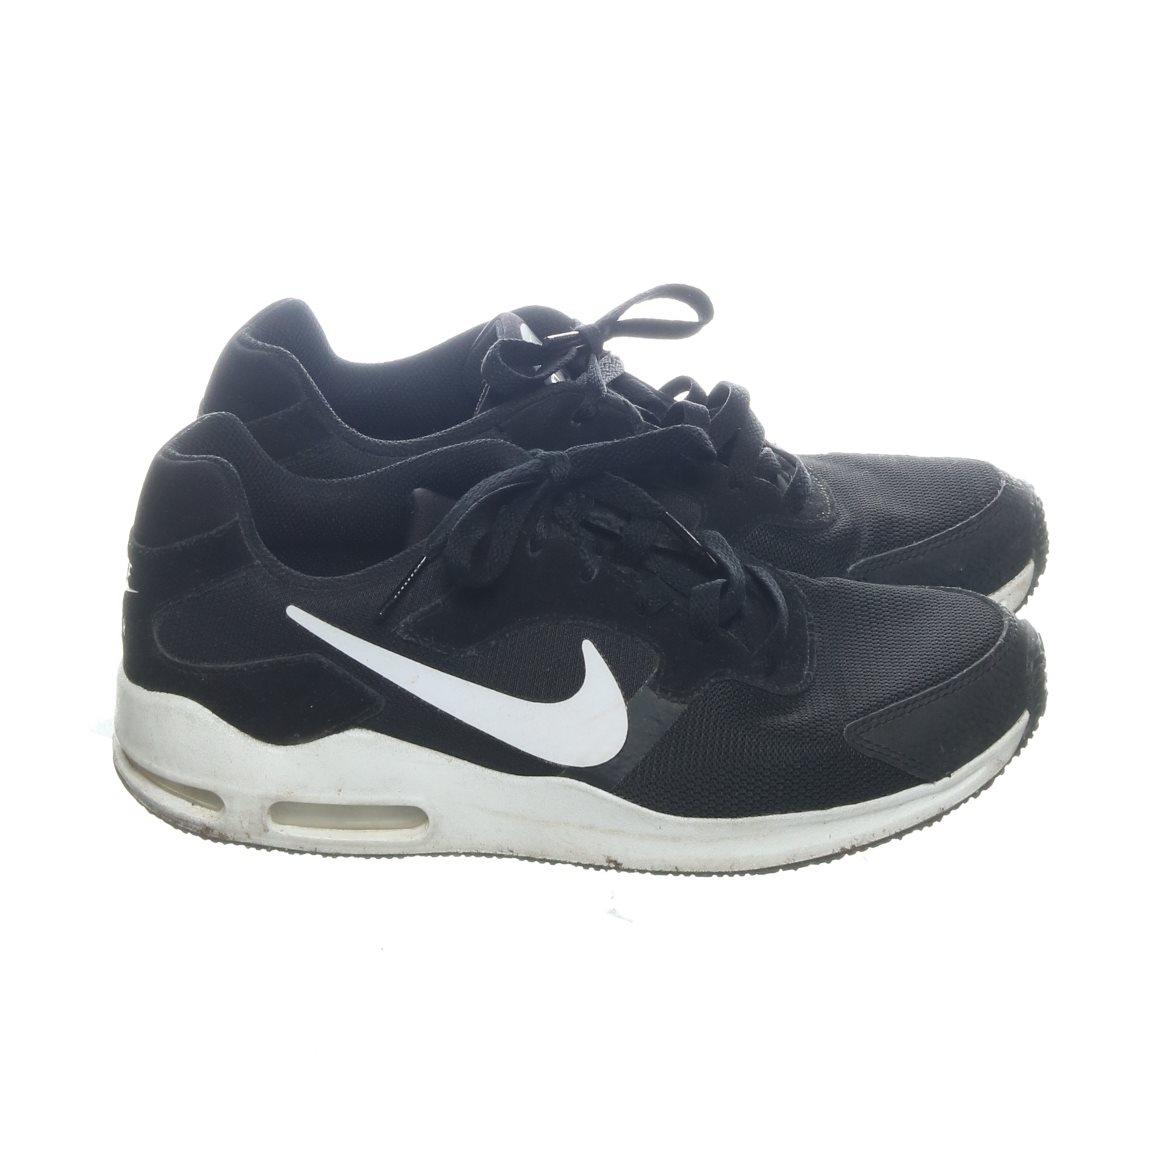 info for ff337 76328 Nike, Sneakers, Strl  39, Free Run 2018, Svart